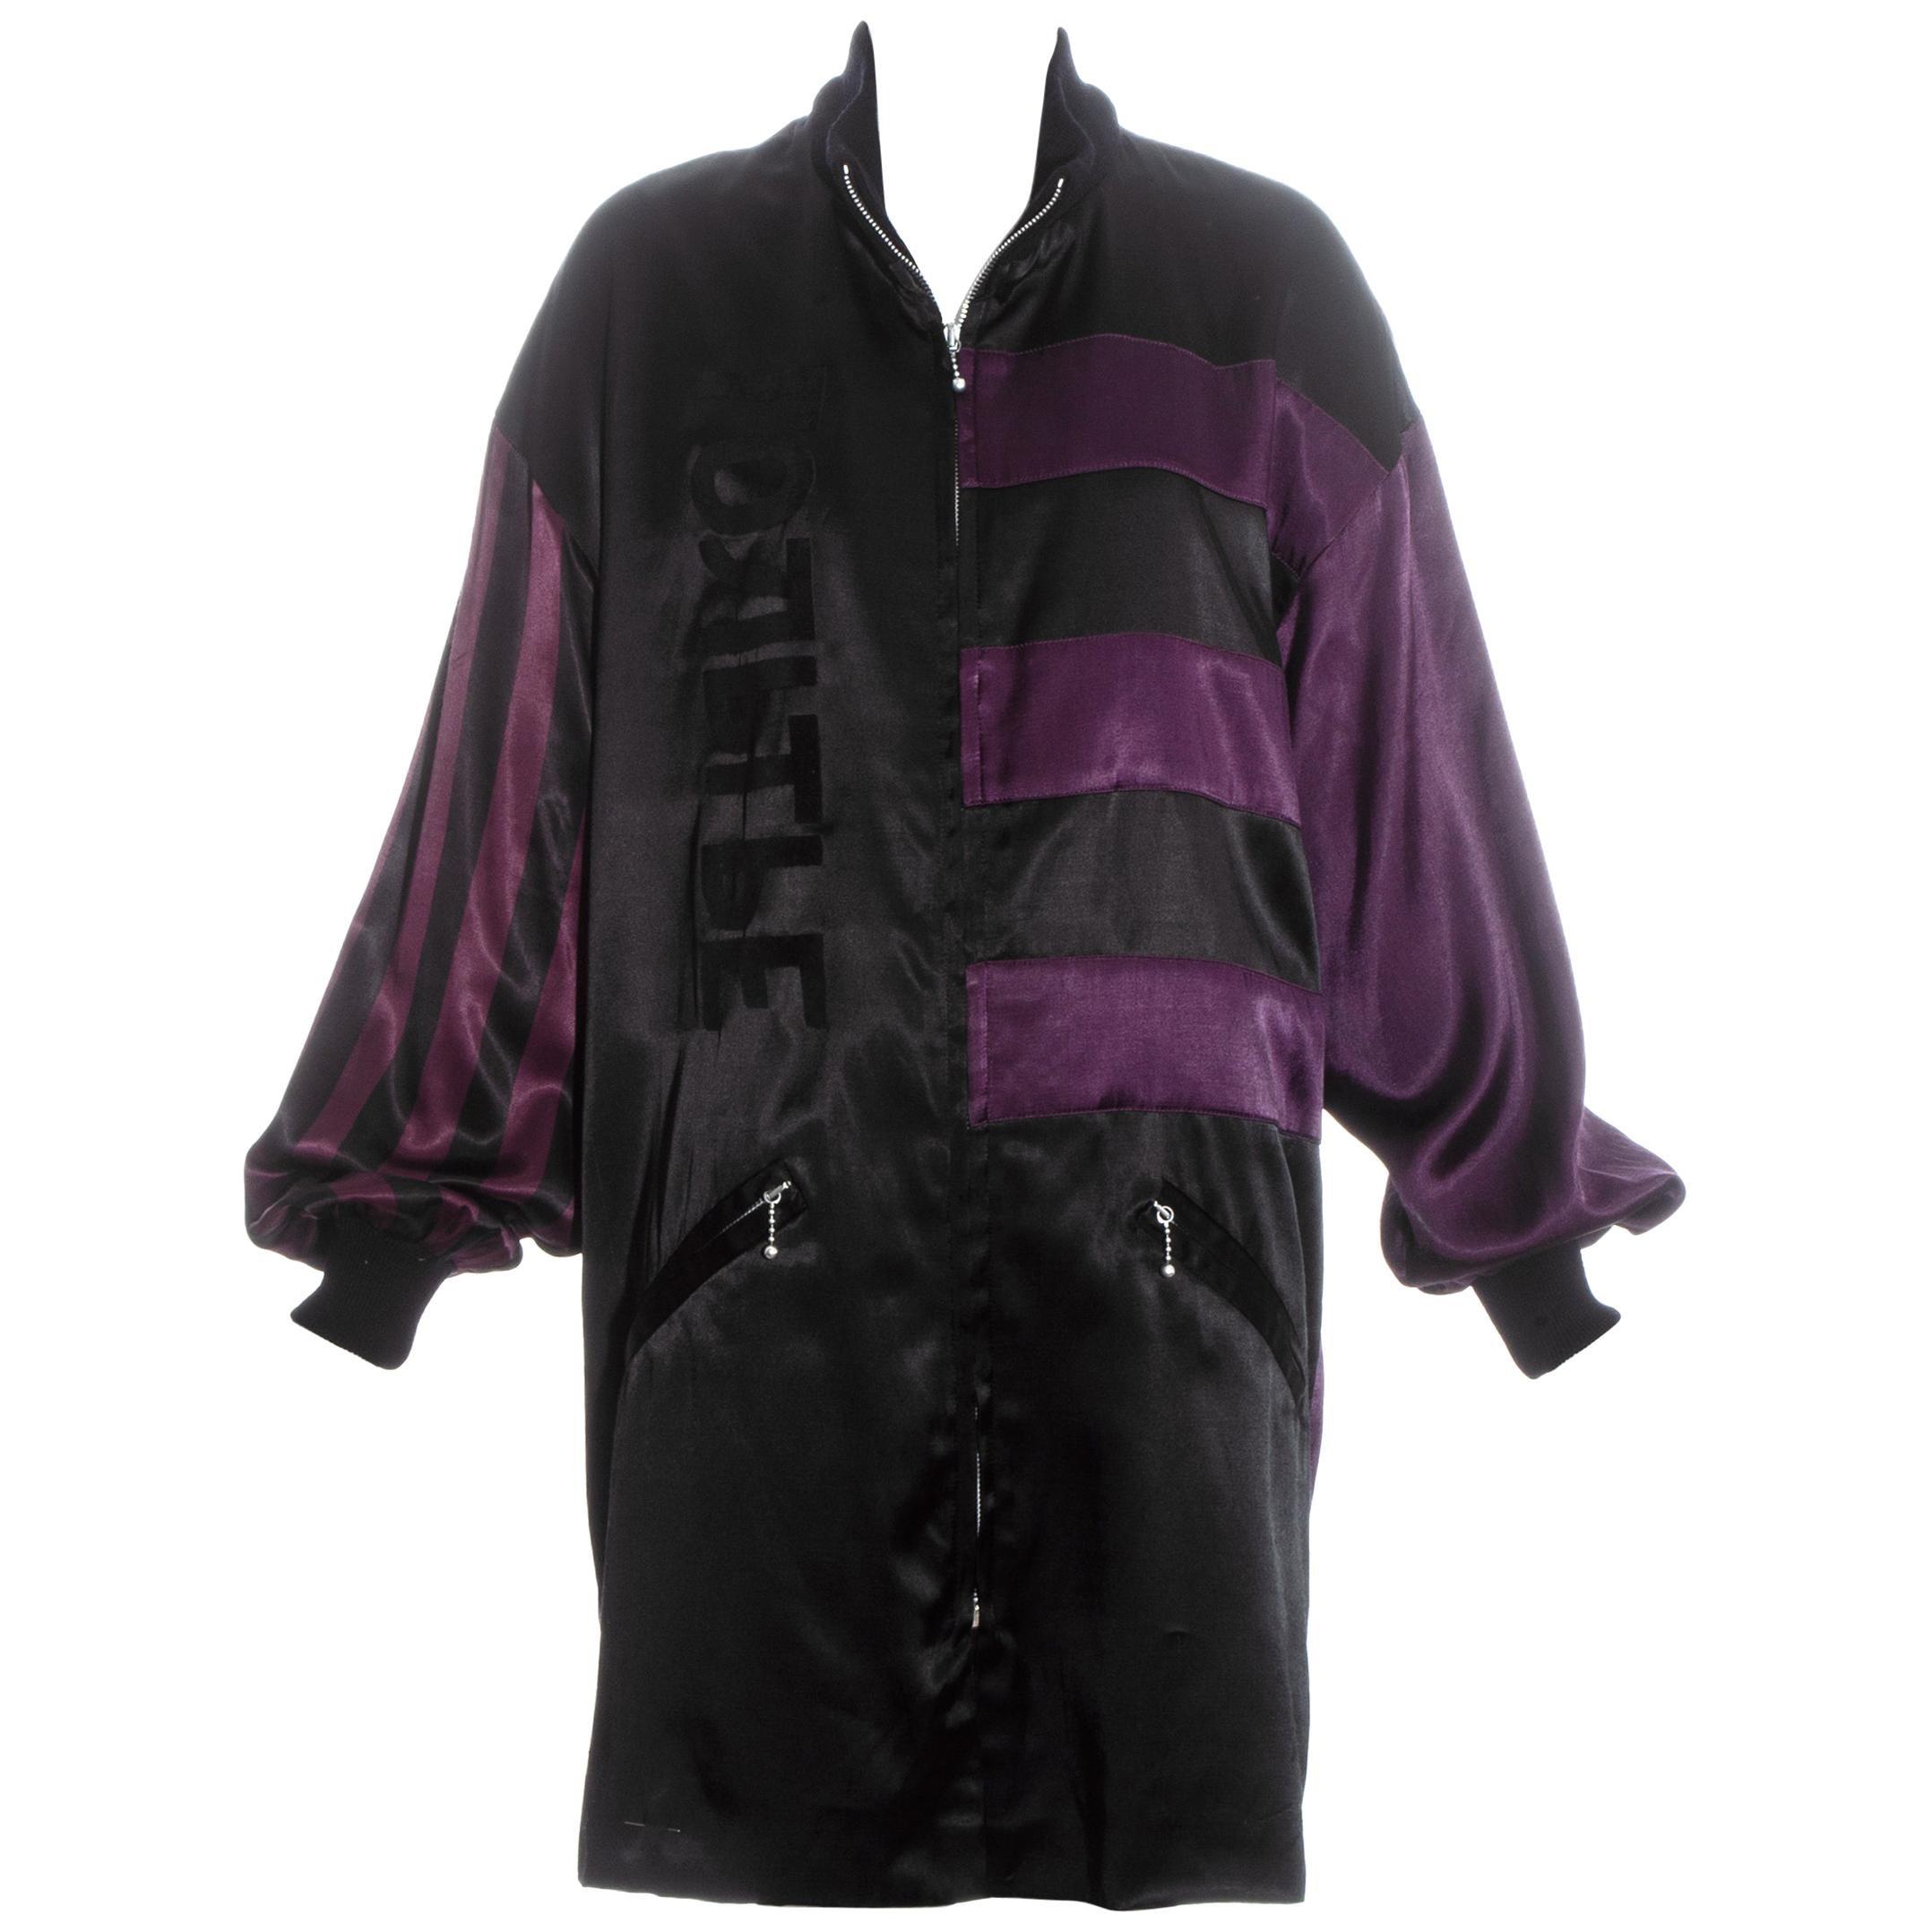 Jean Paul Gaultier purple and black satin jacket, fw 1986